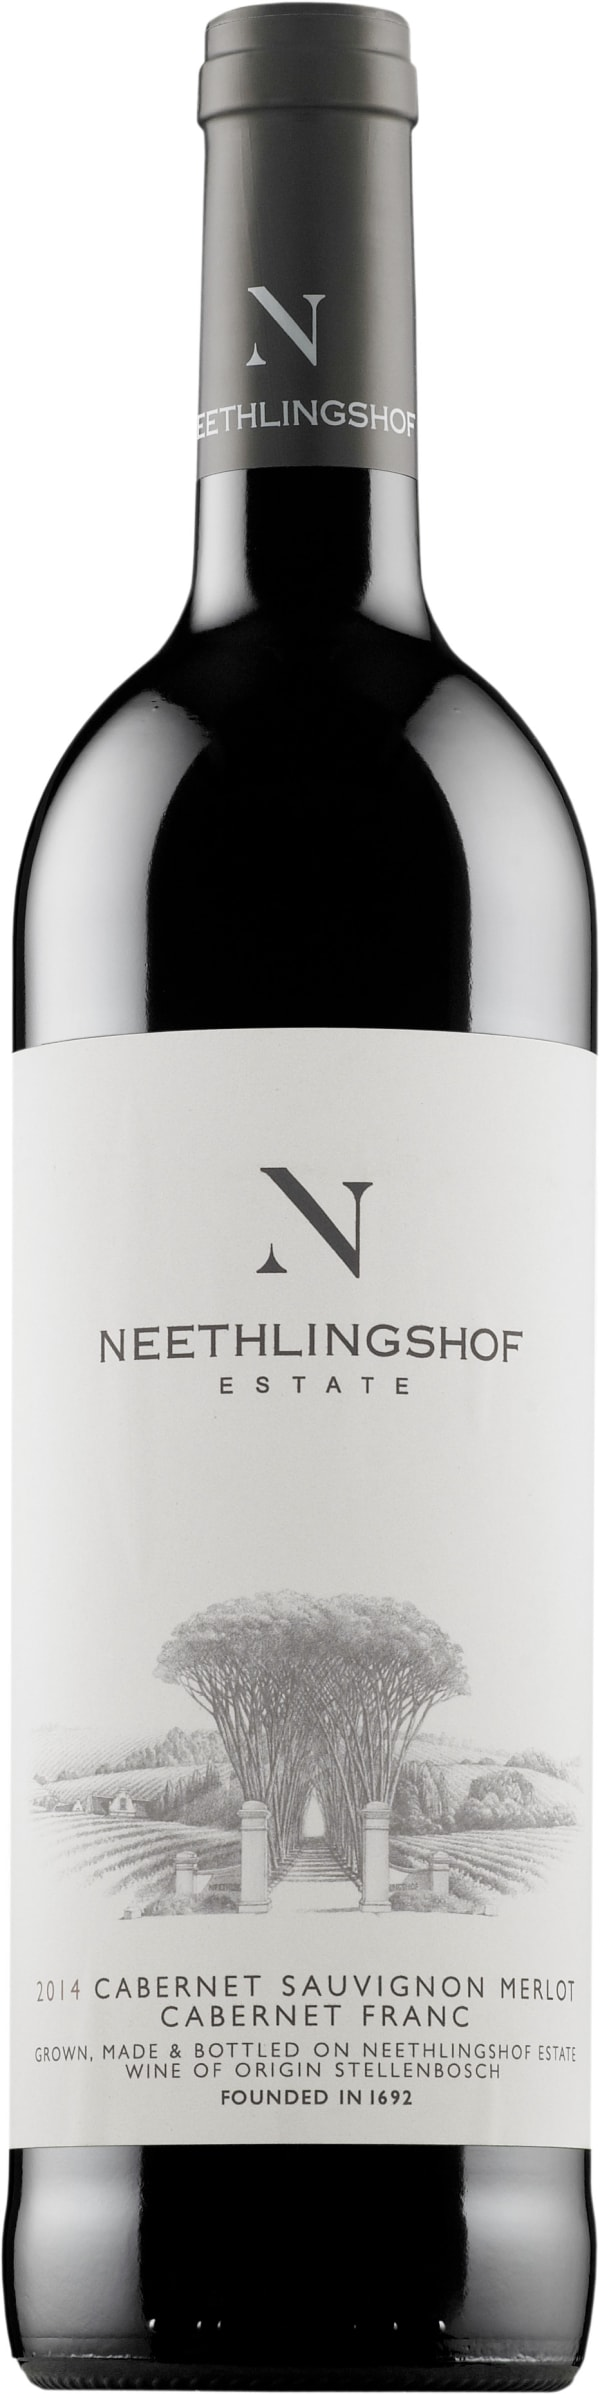 Neethlingshof 2015